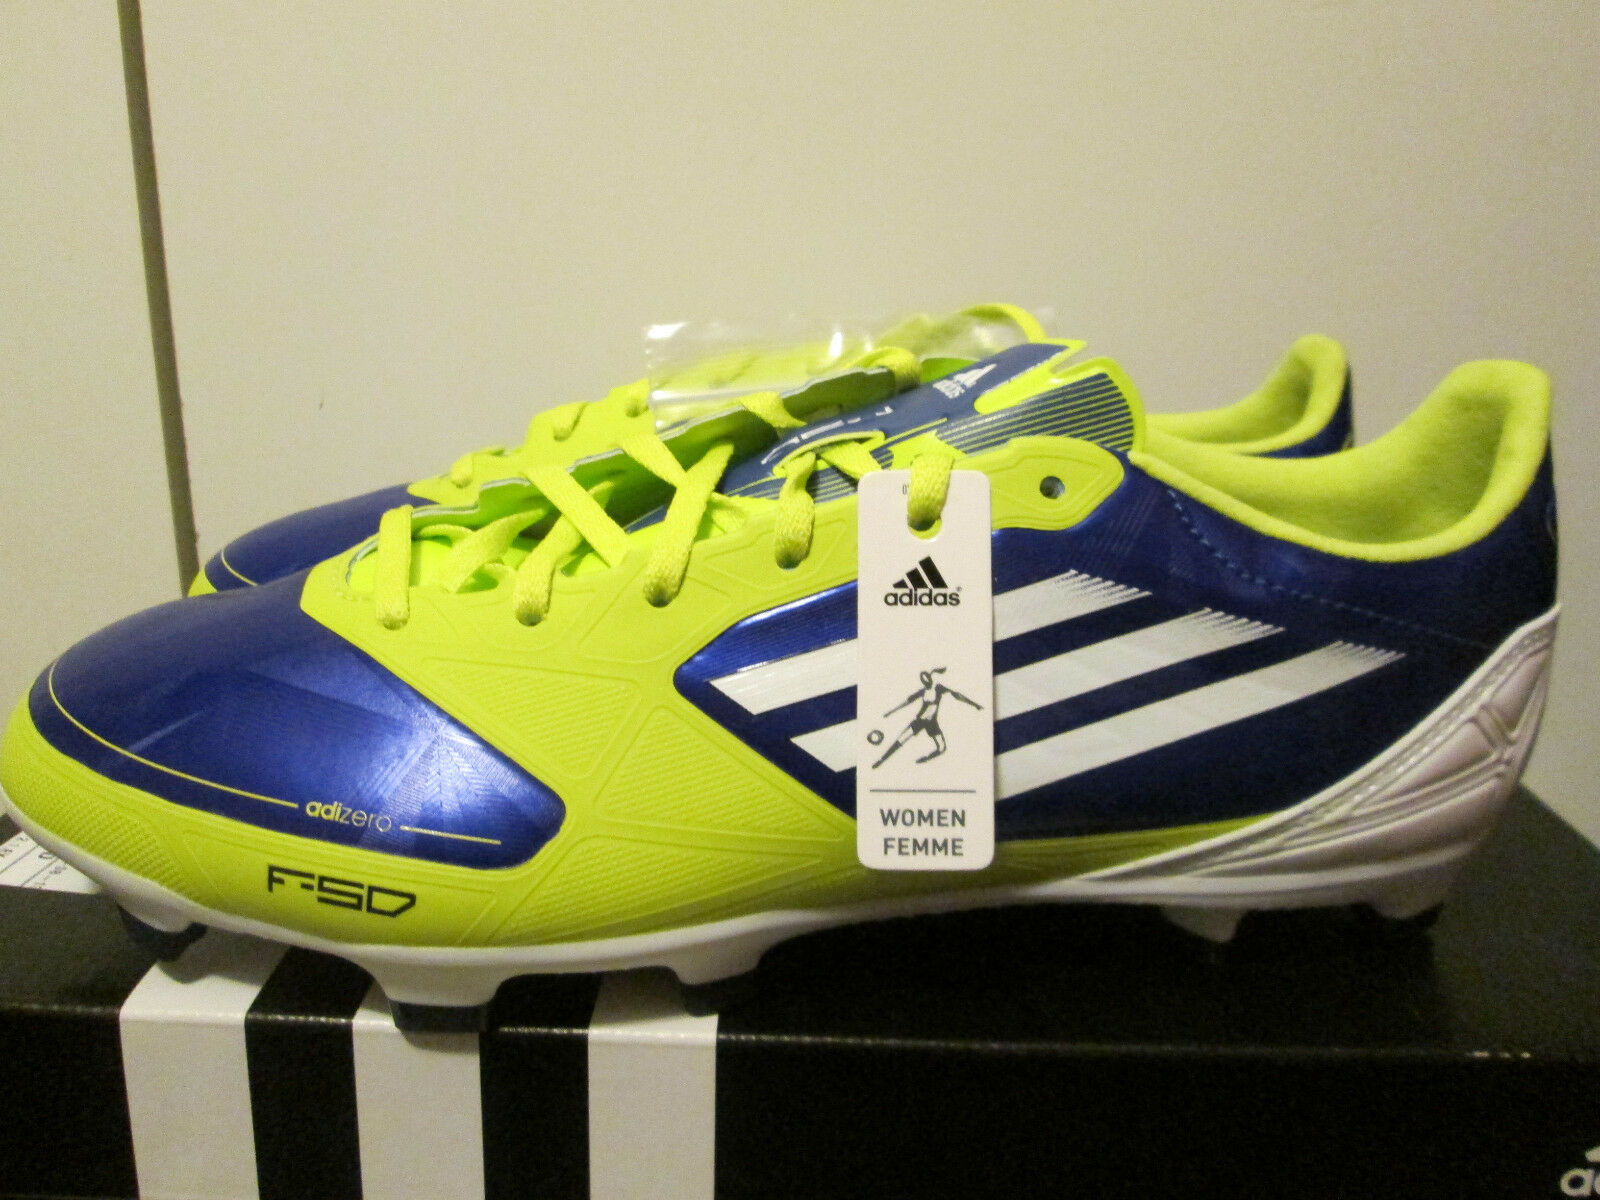 Adidas Adizero F30 TRX FG blu bianca Lime Lightweight Soccer Cleats Dimensione 9 NEW